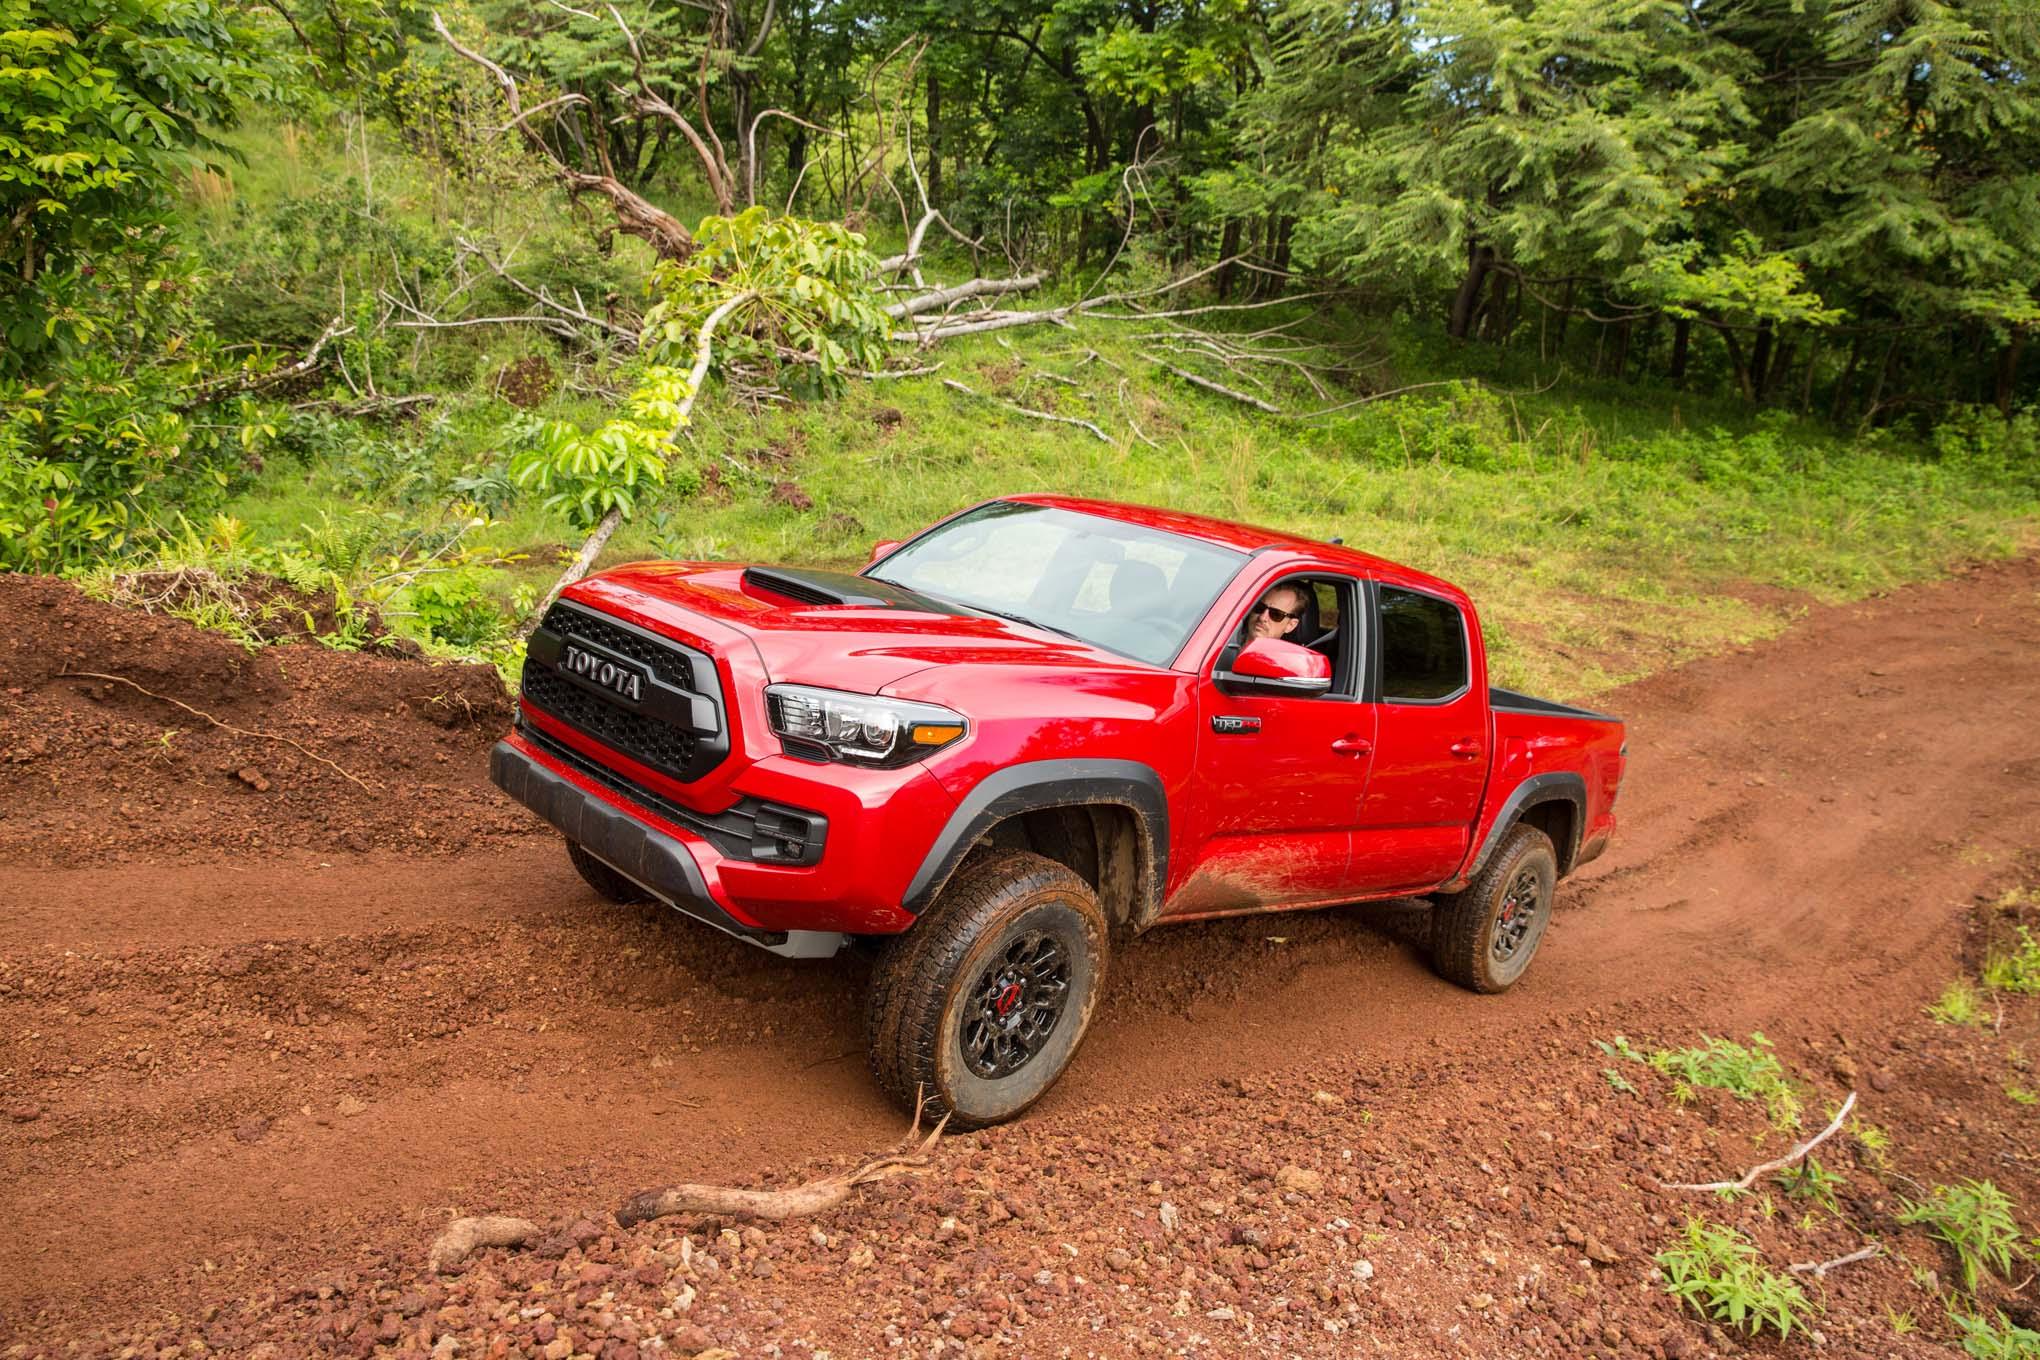 2019 Toyota Tacoma TRD Pro Teased Ahead of Debut | Automobile Magazine